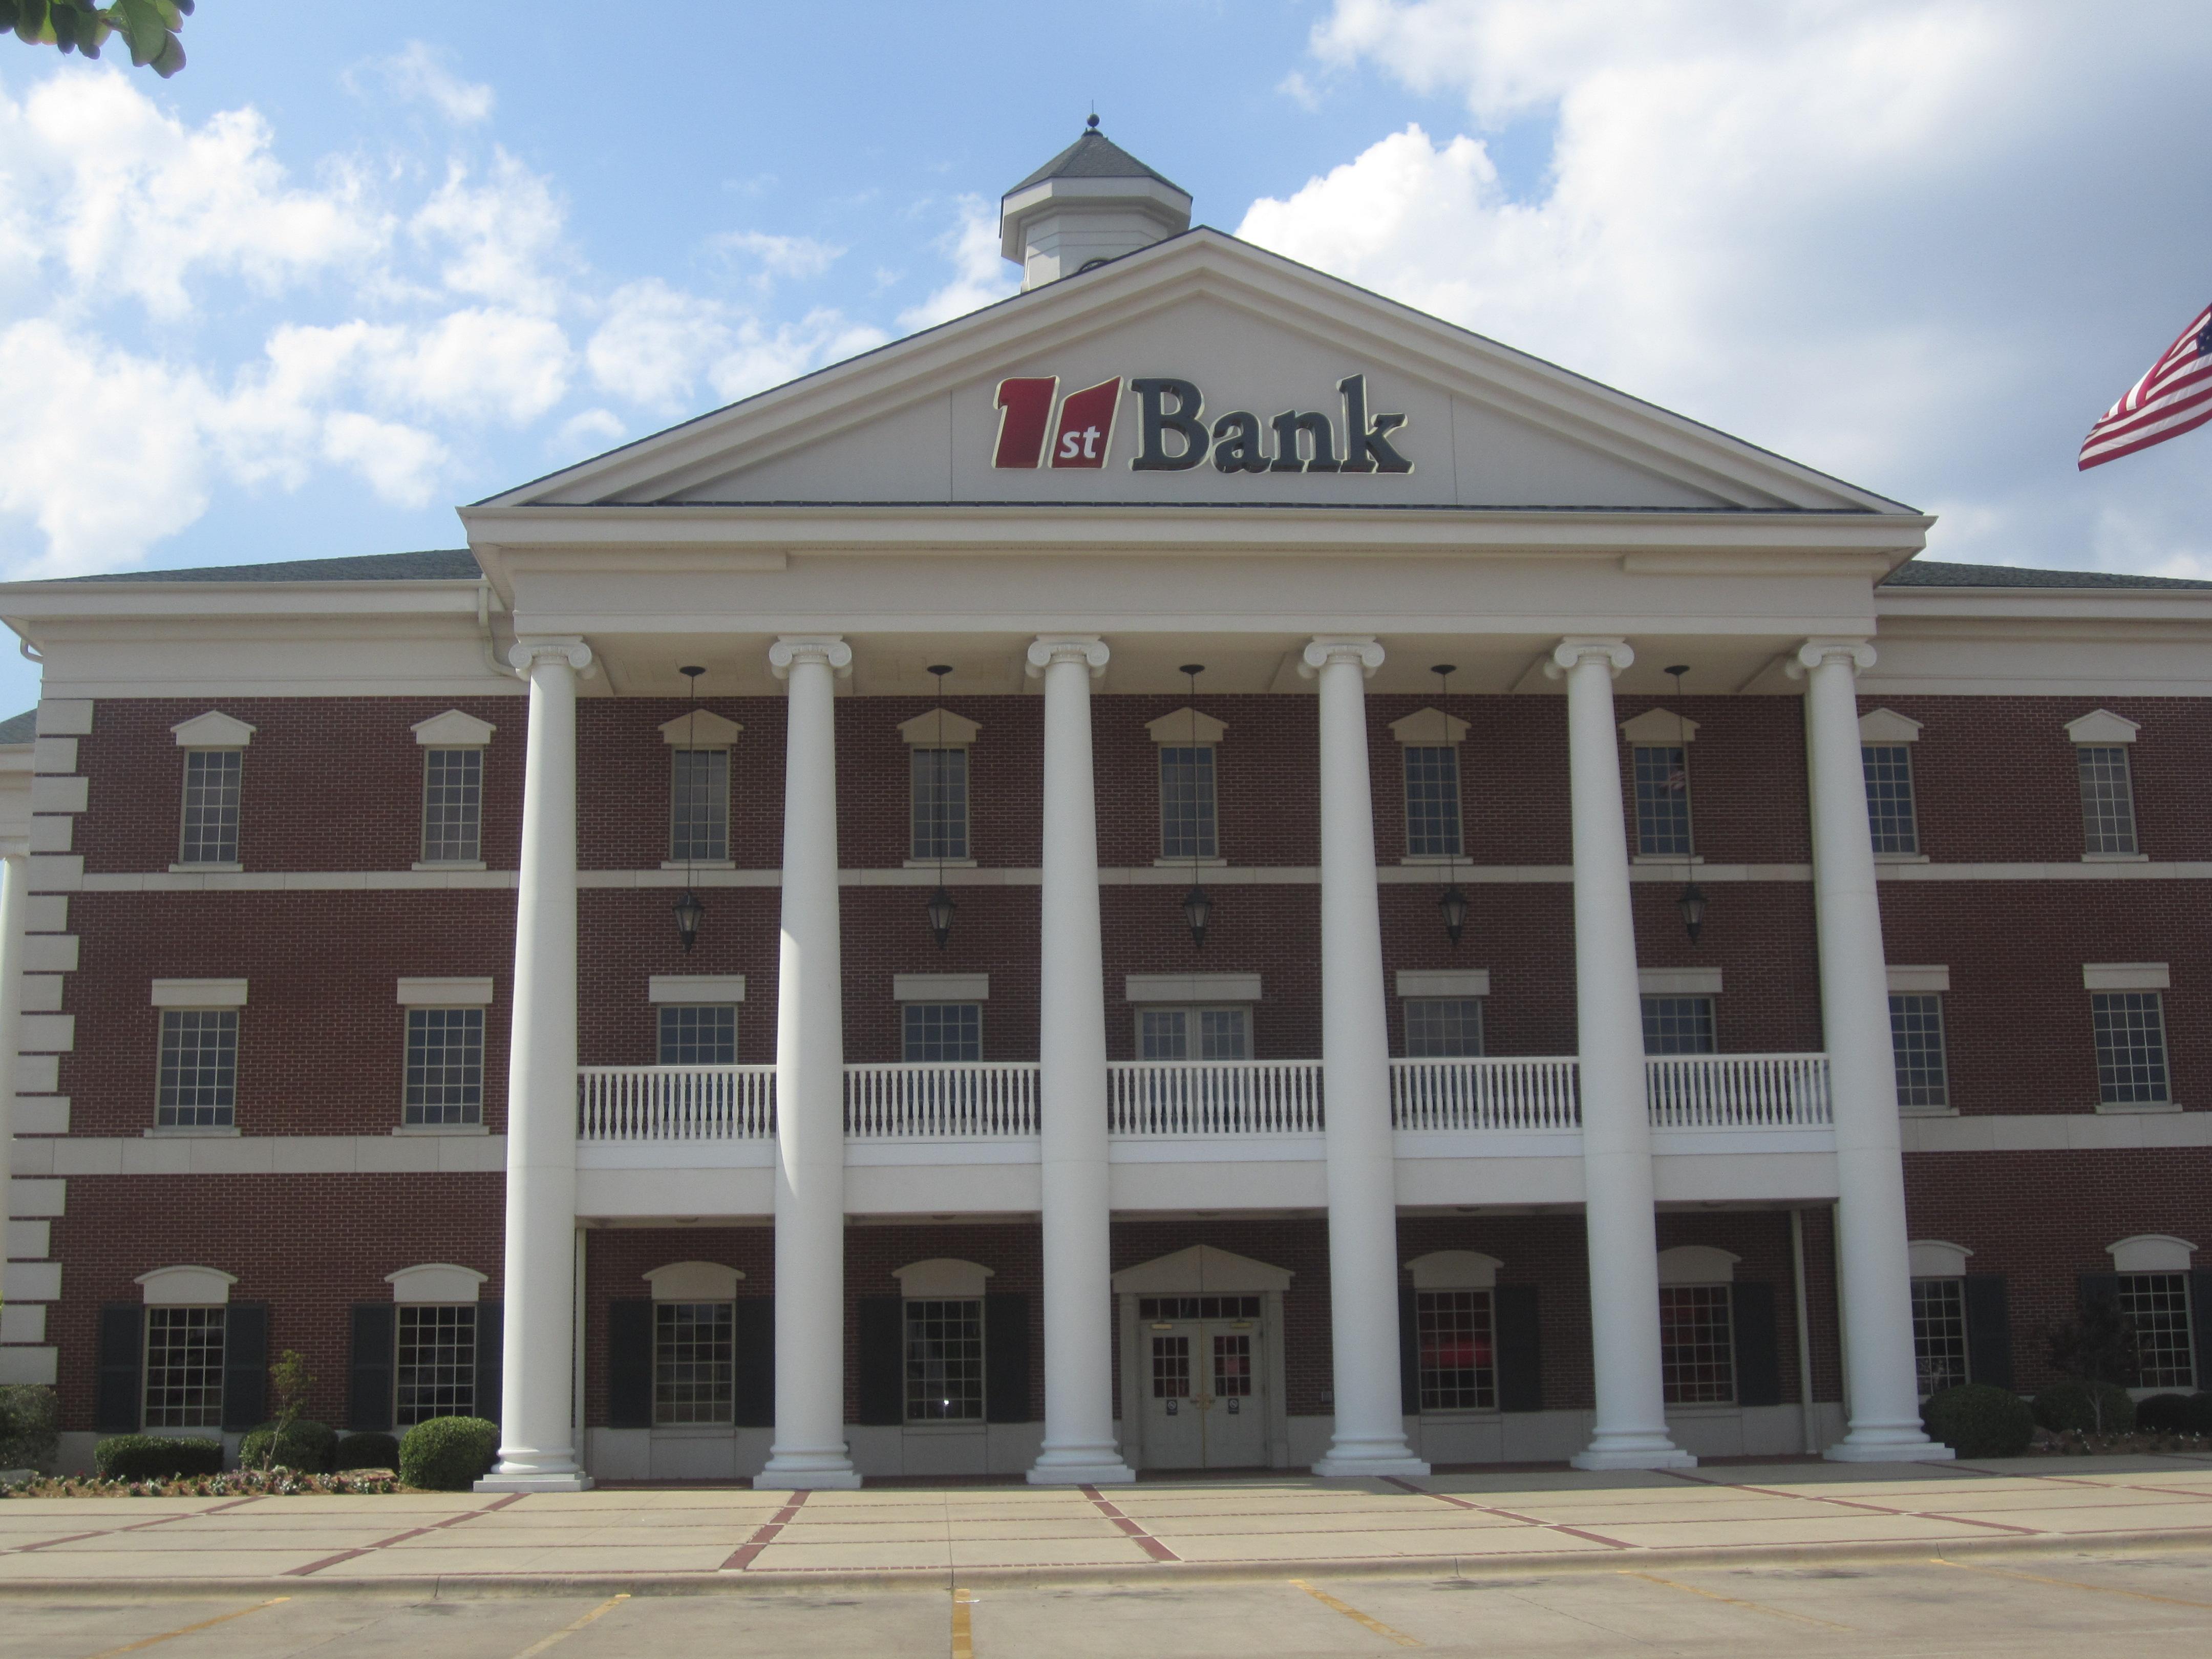 Dating in banks arkansas